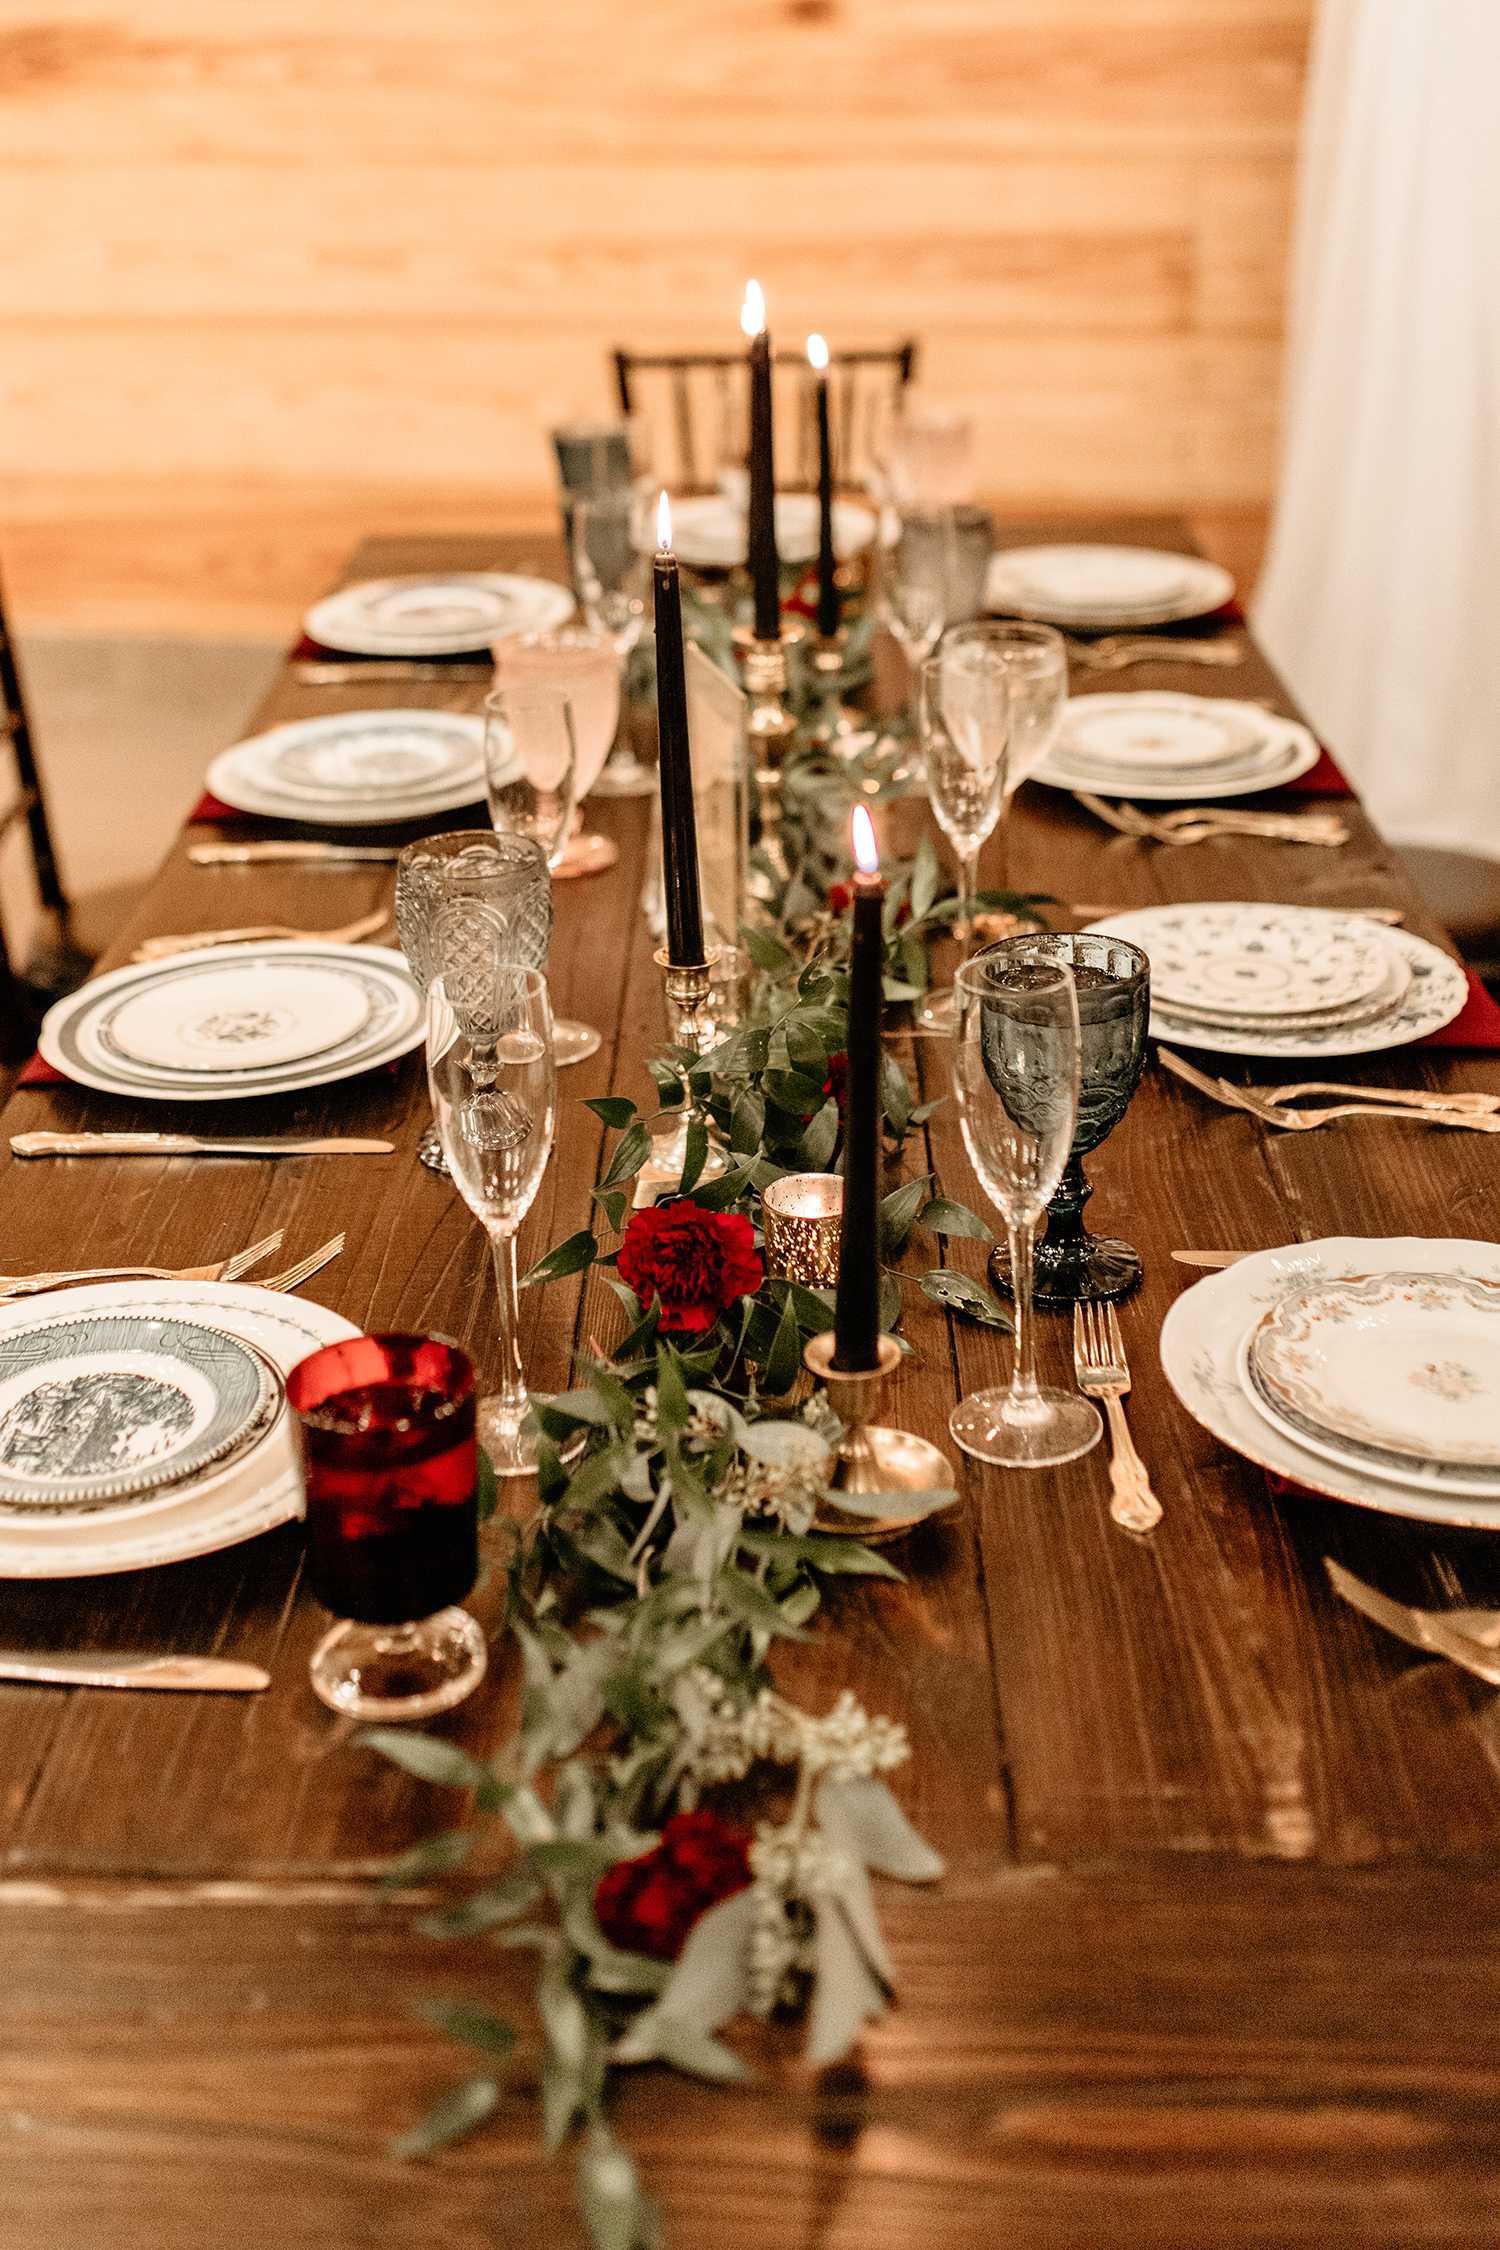 aerielle dyan wedding tables